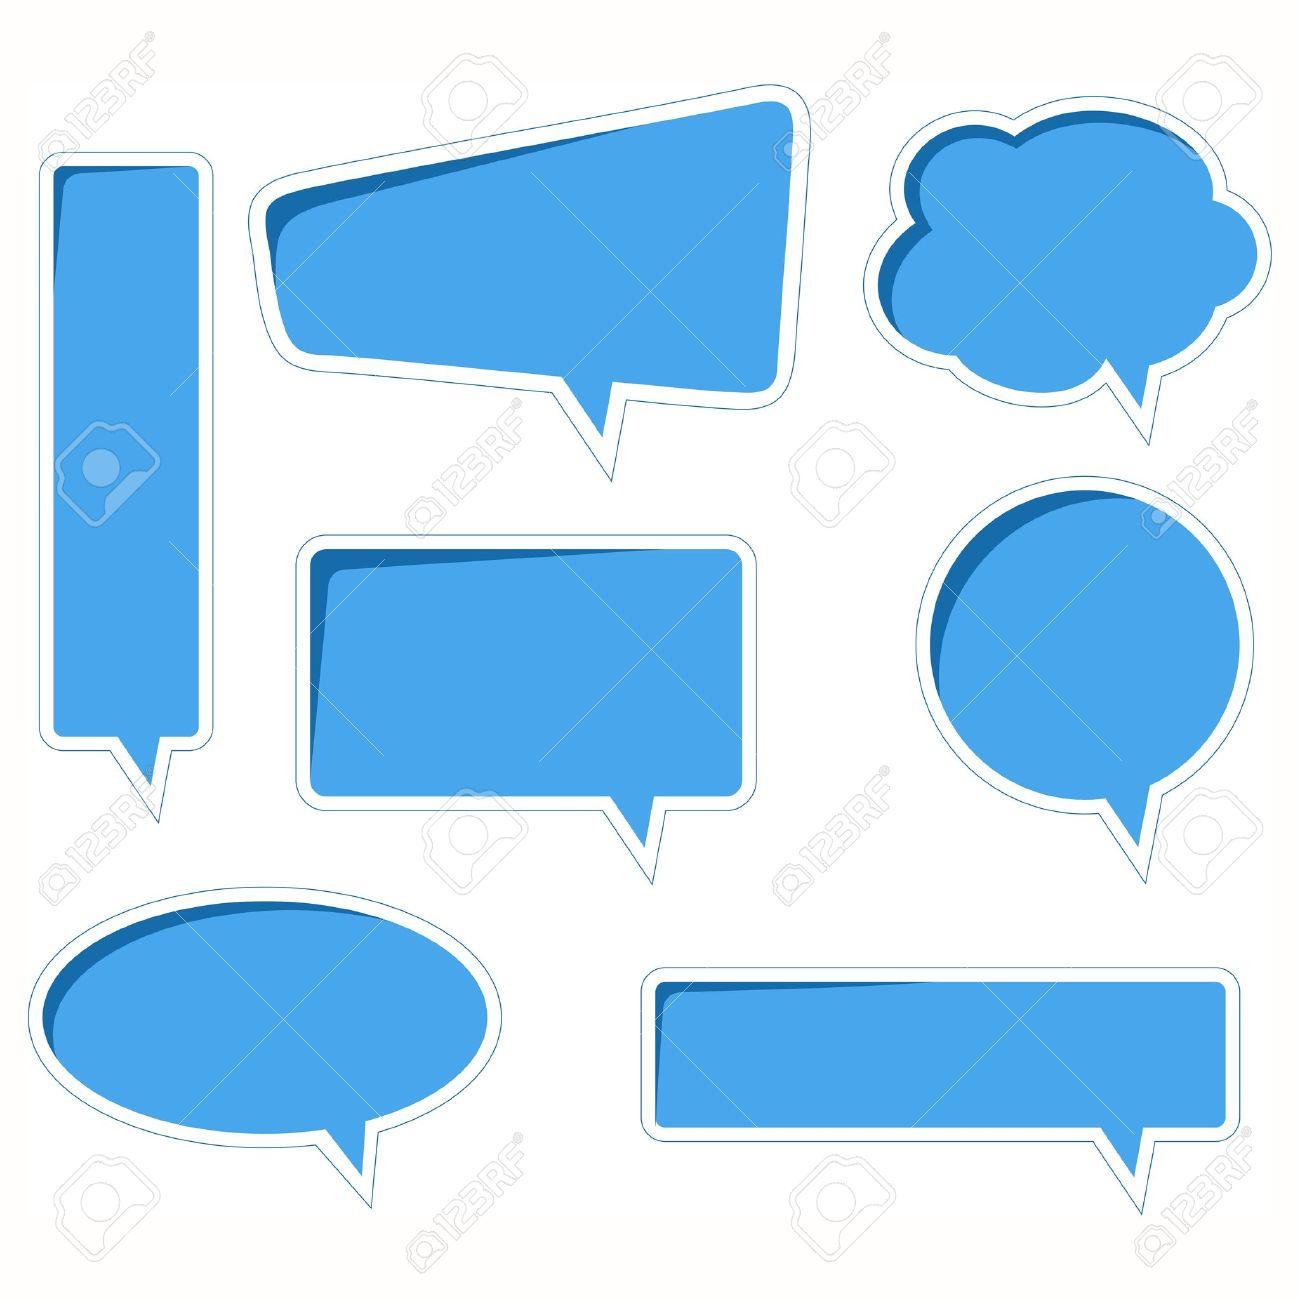 blue vector speech bubbles with realistic shading and shadows rh 123rf com free vector cartoon speech bubbles free vector speech bubble download